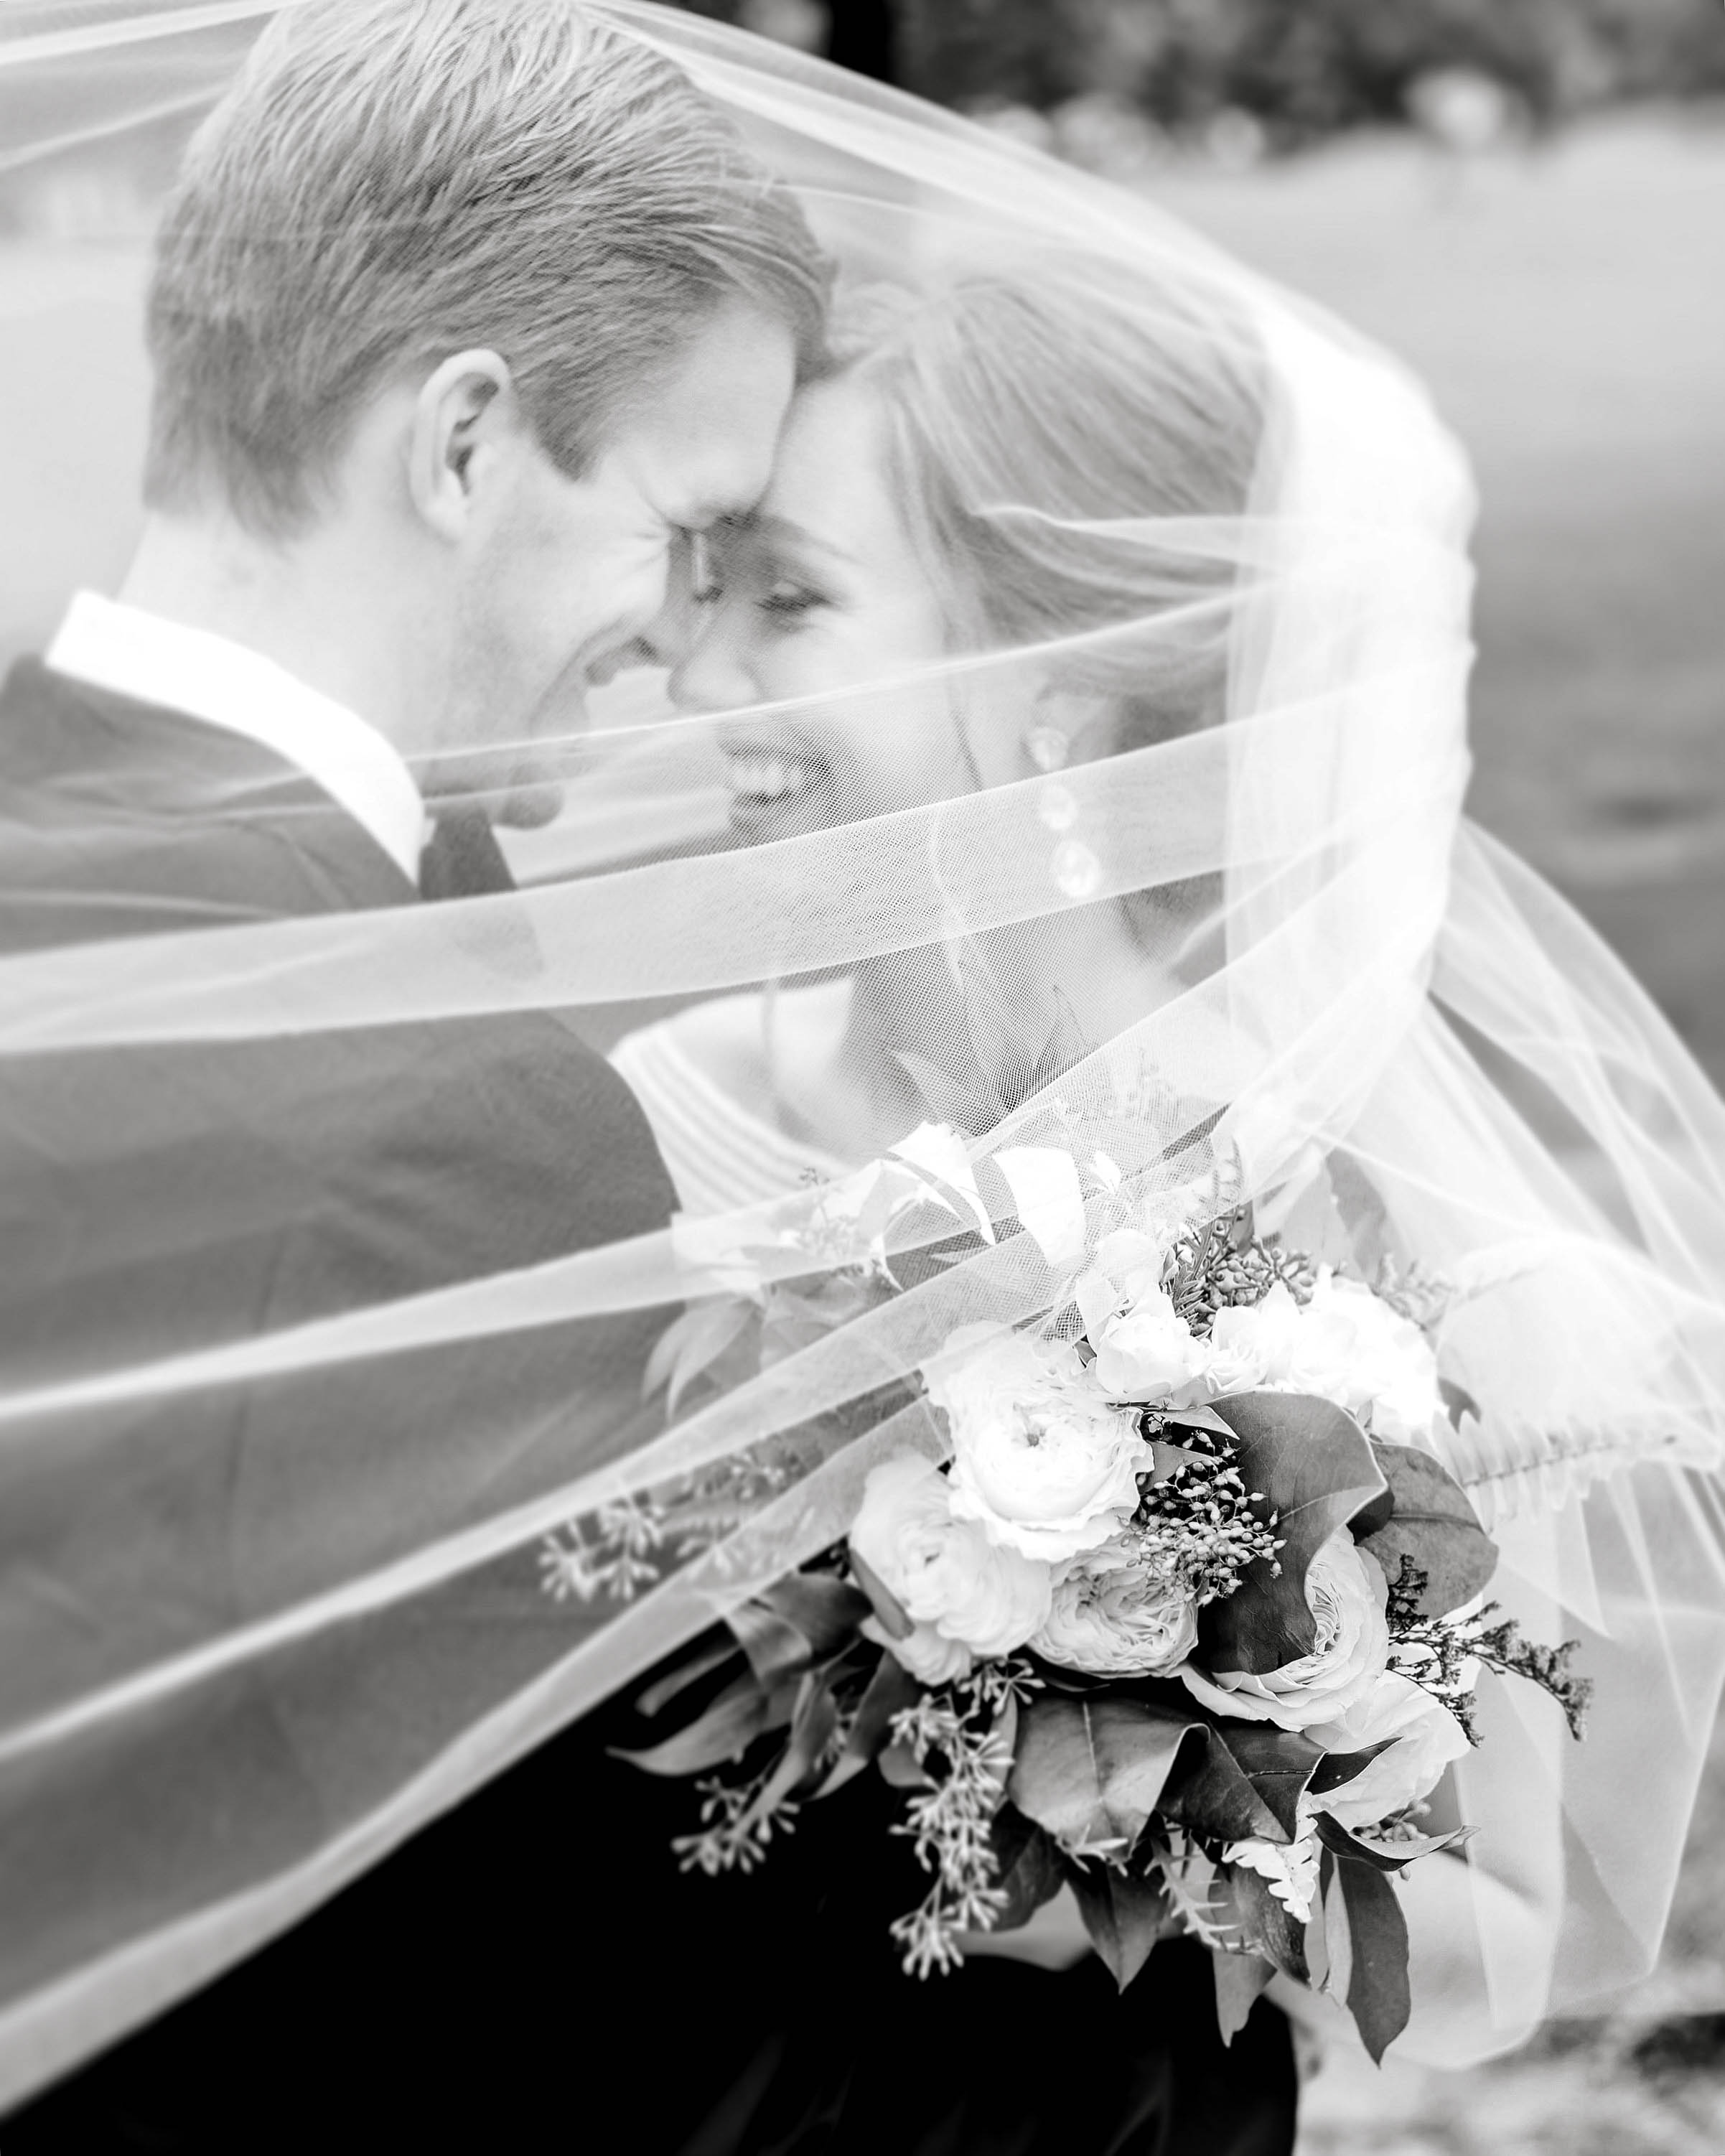 gray-door-photography-wedding-portraits-dallas-photographer-steph-erffmeyer6.jpg